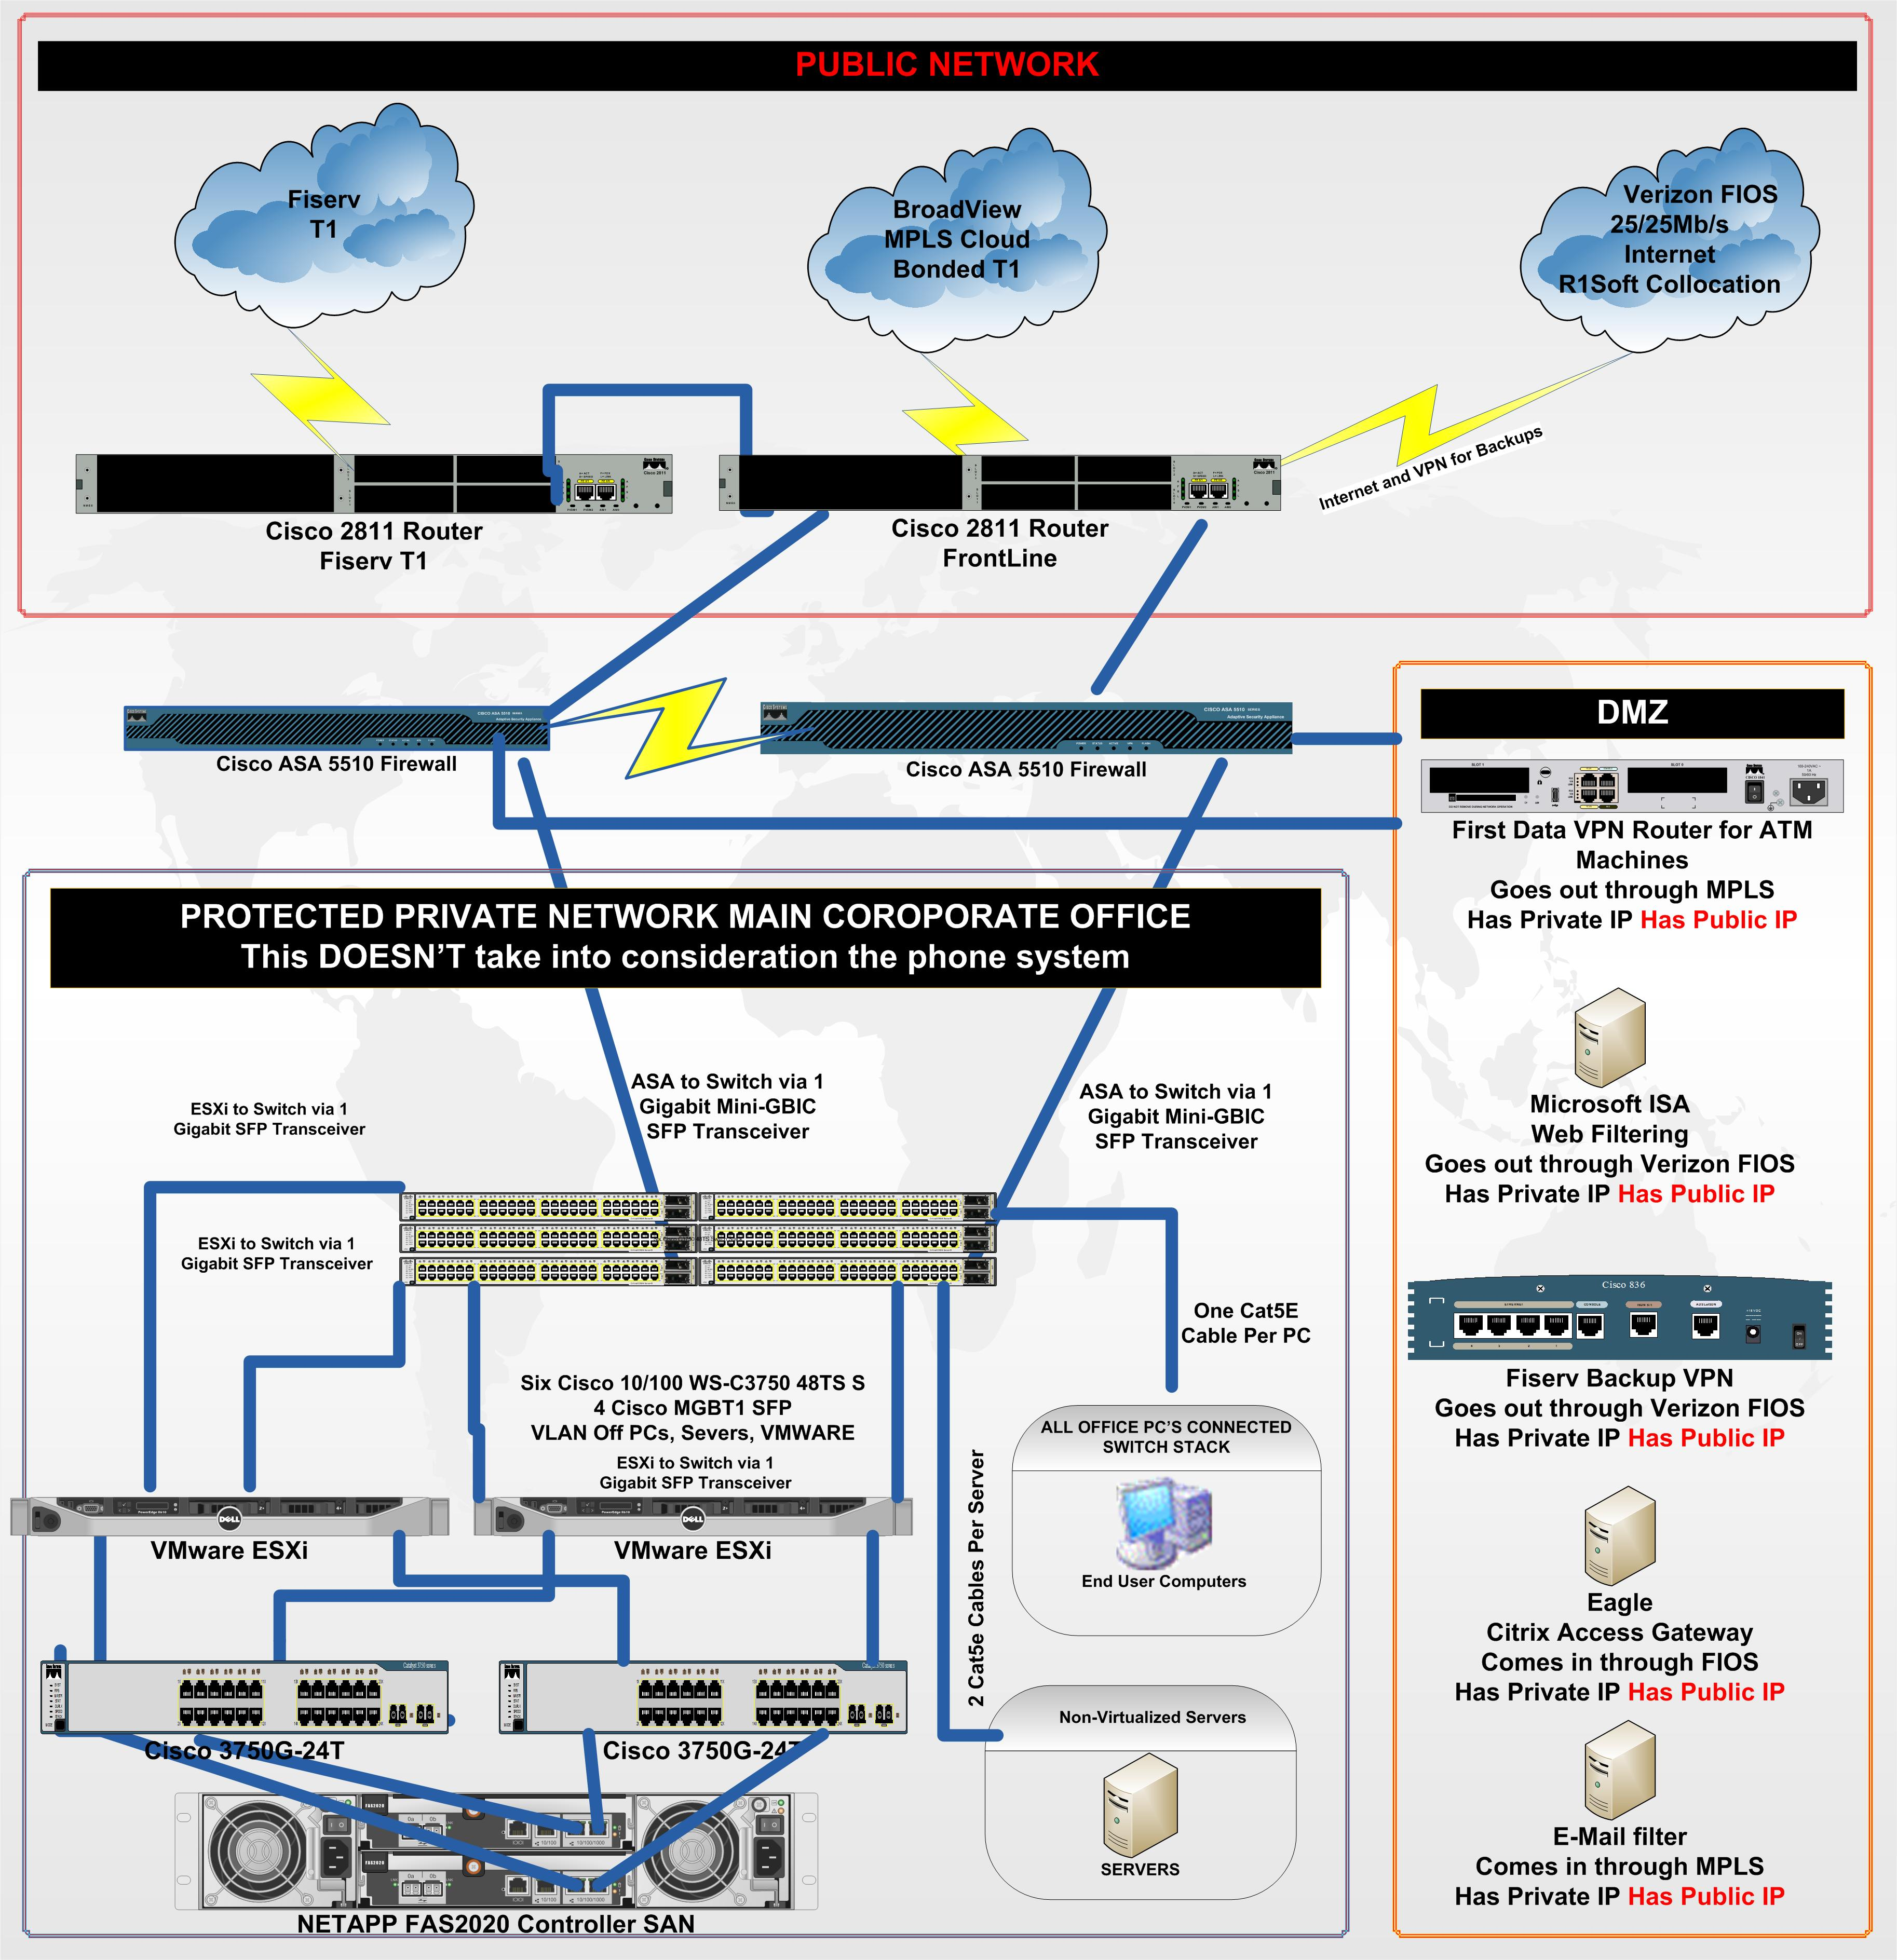 Cisco switch visio stencils marketing mix analysis example cisco asa 5510 initial visio design ewing hq network map proposed cisco asa 5510 initial visio designhtml cisco switch visio stencils buycottarizona Images